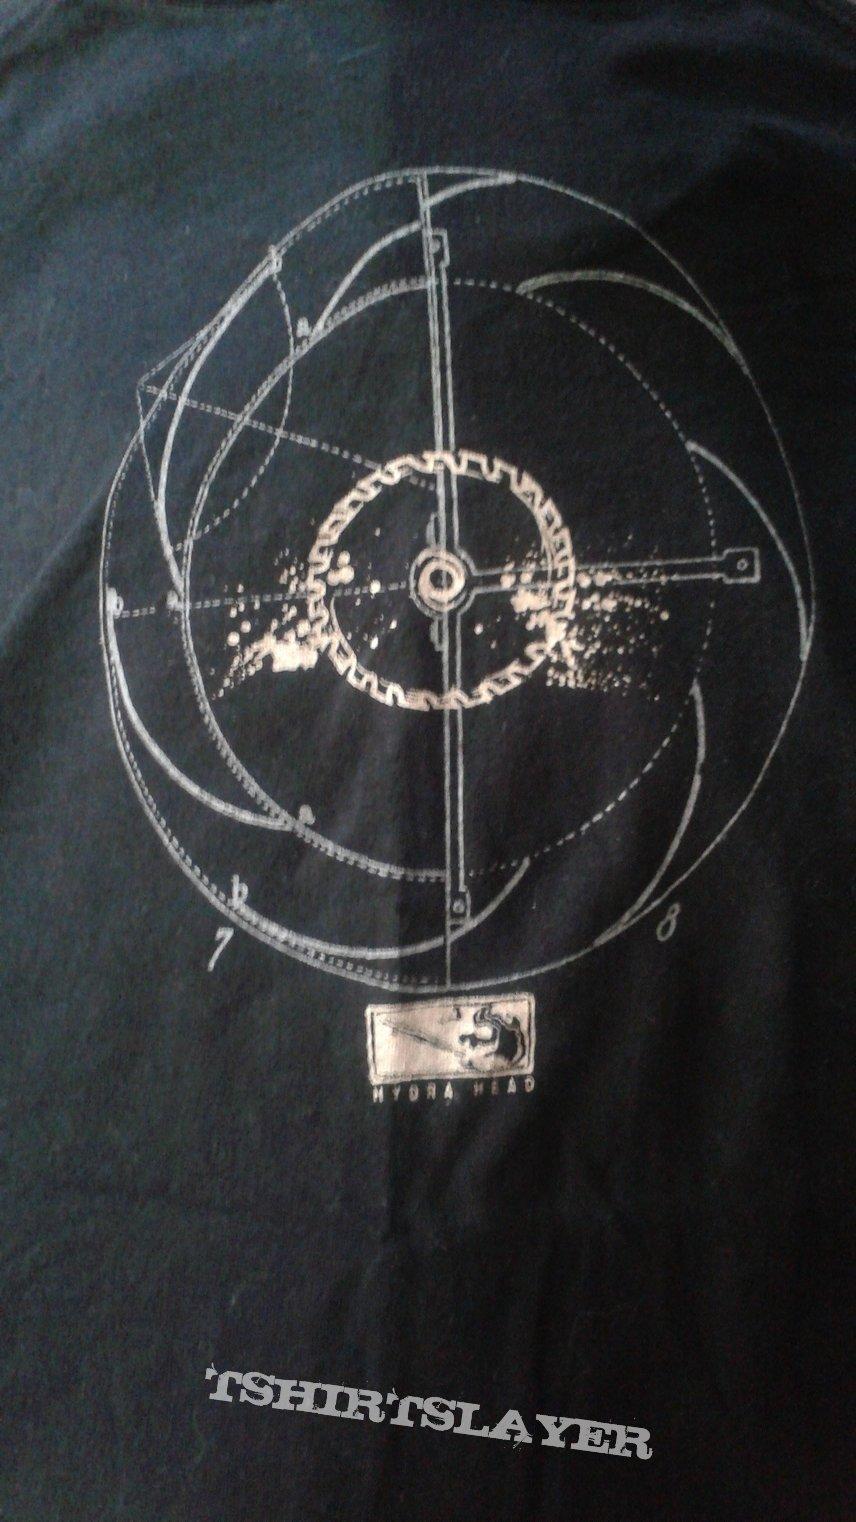 Jesuit saw blade logo t-shirt.